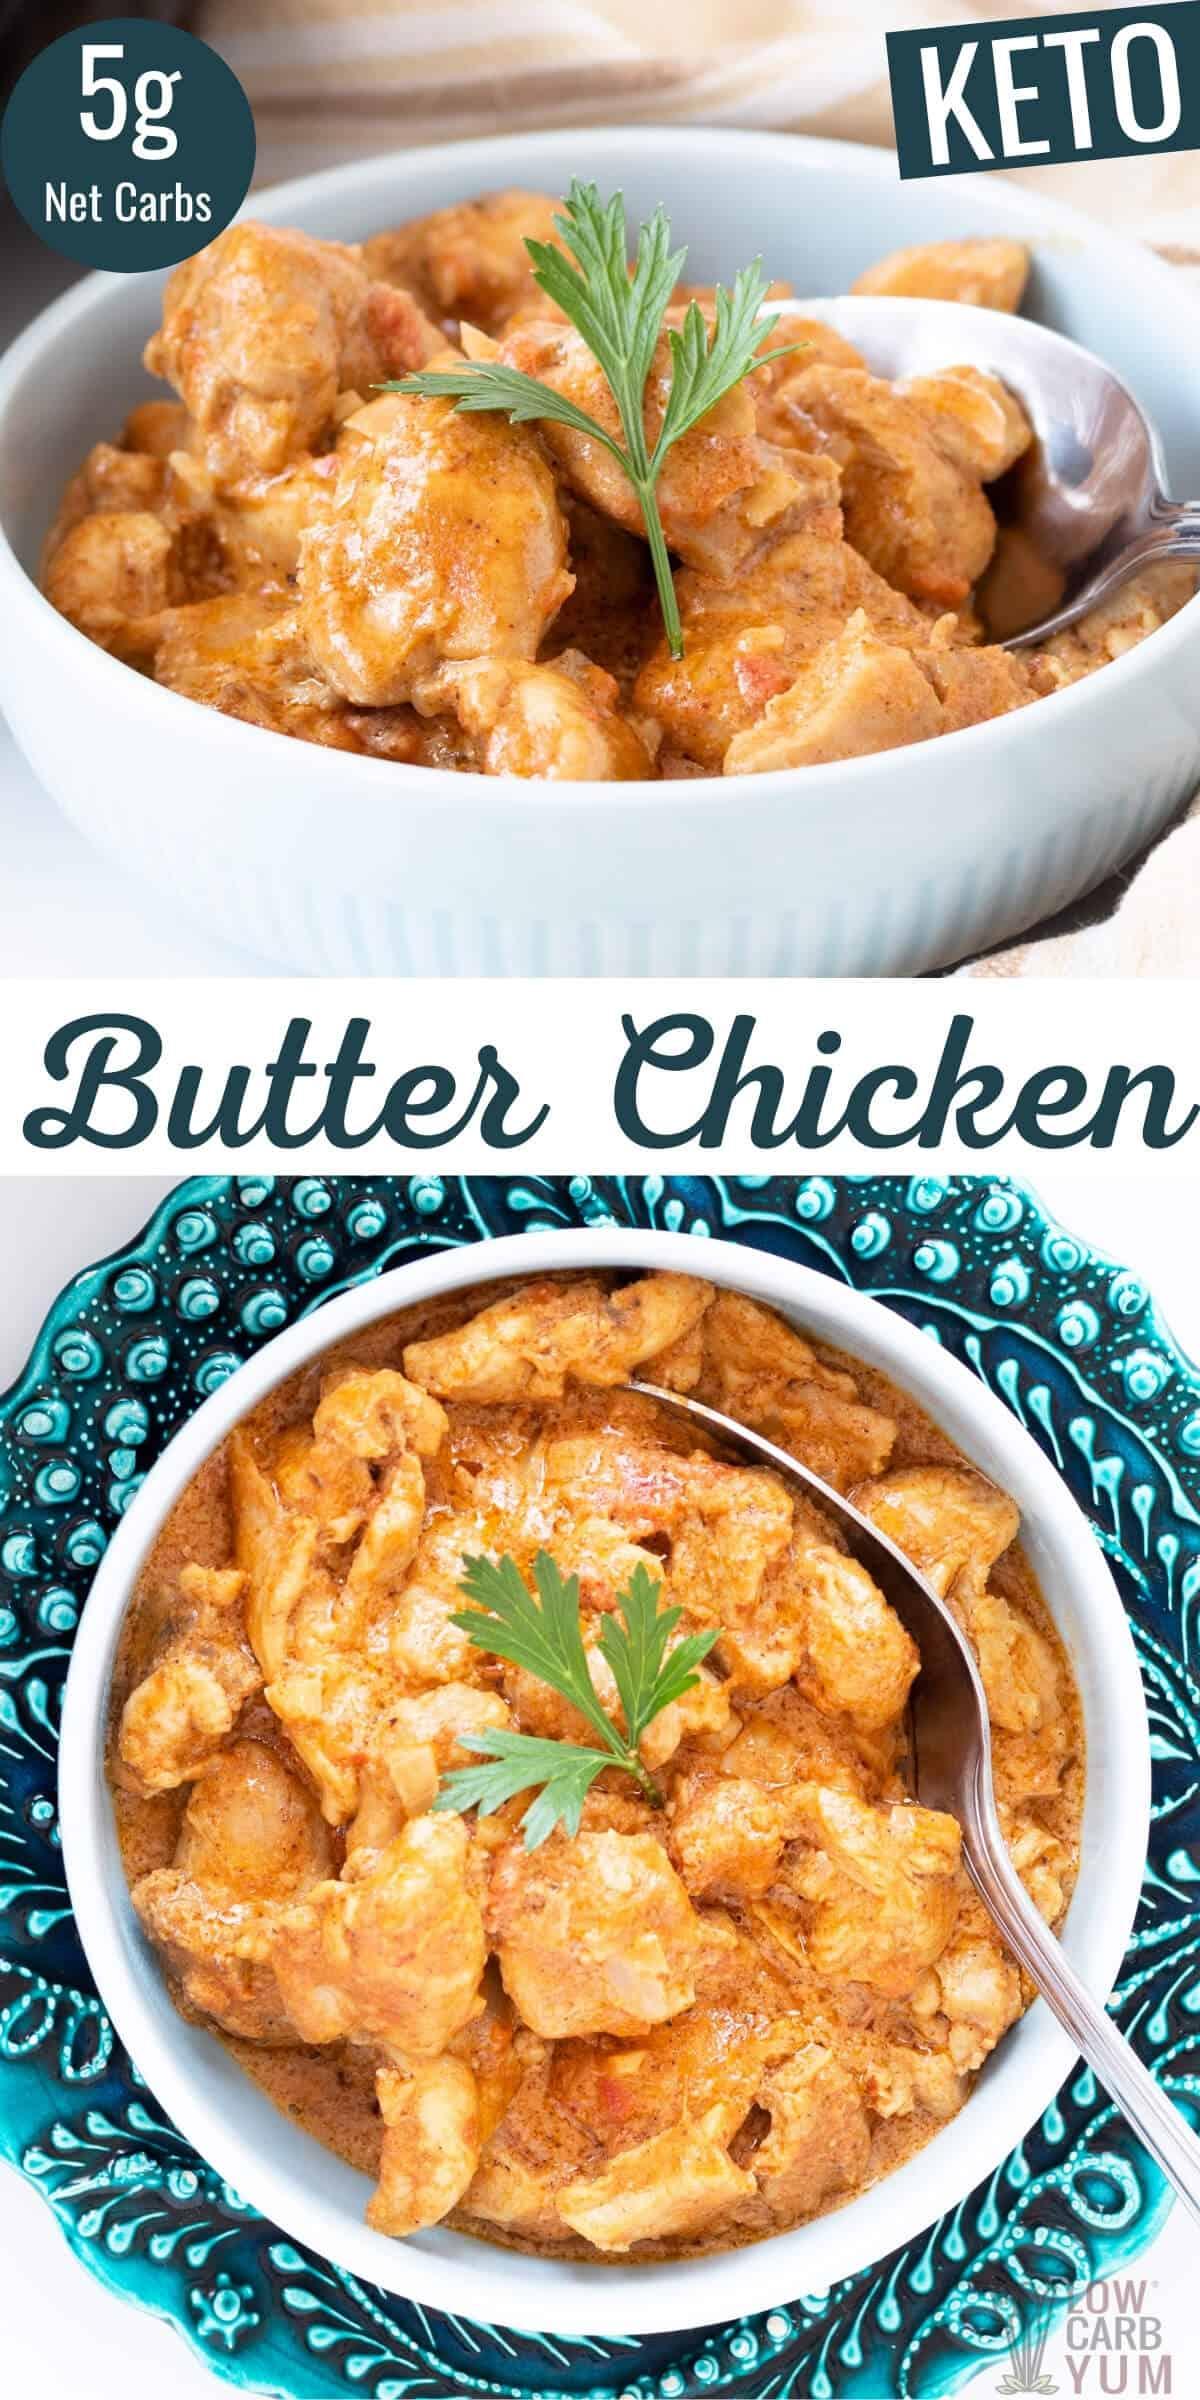 keto butter chicken recipe